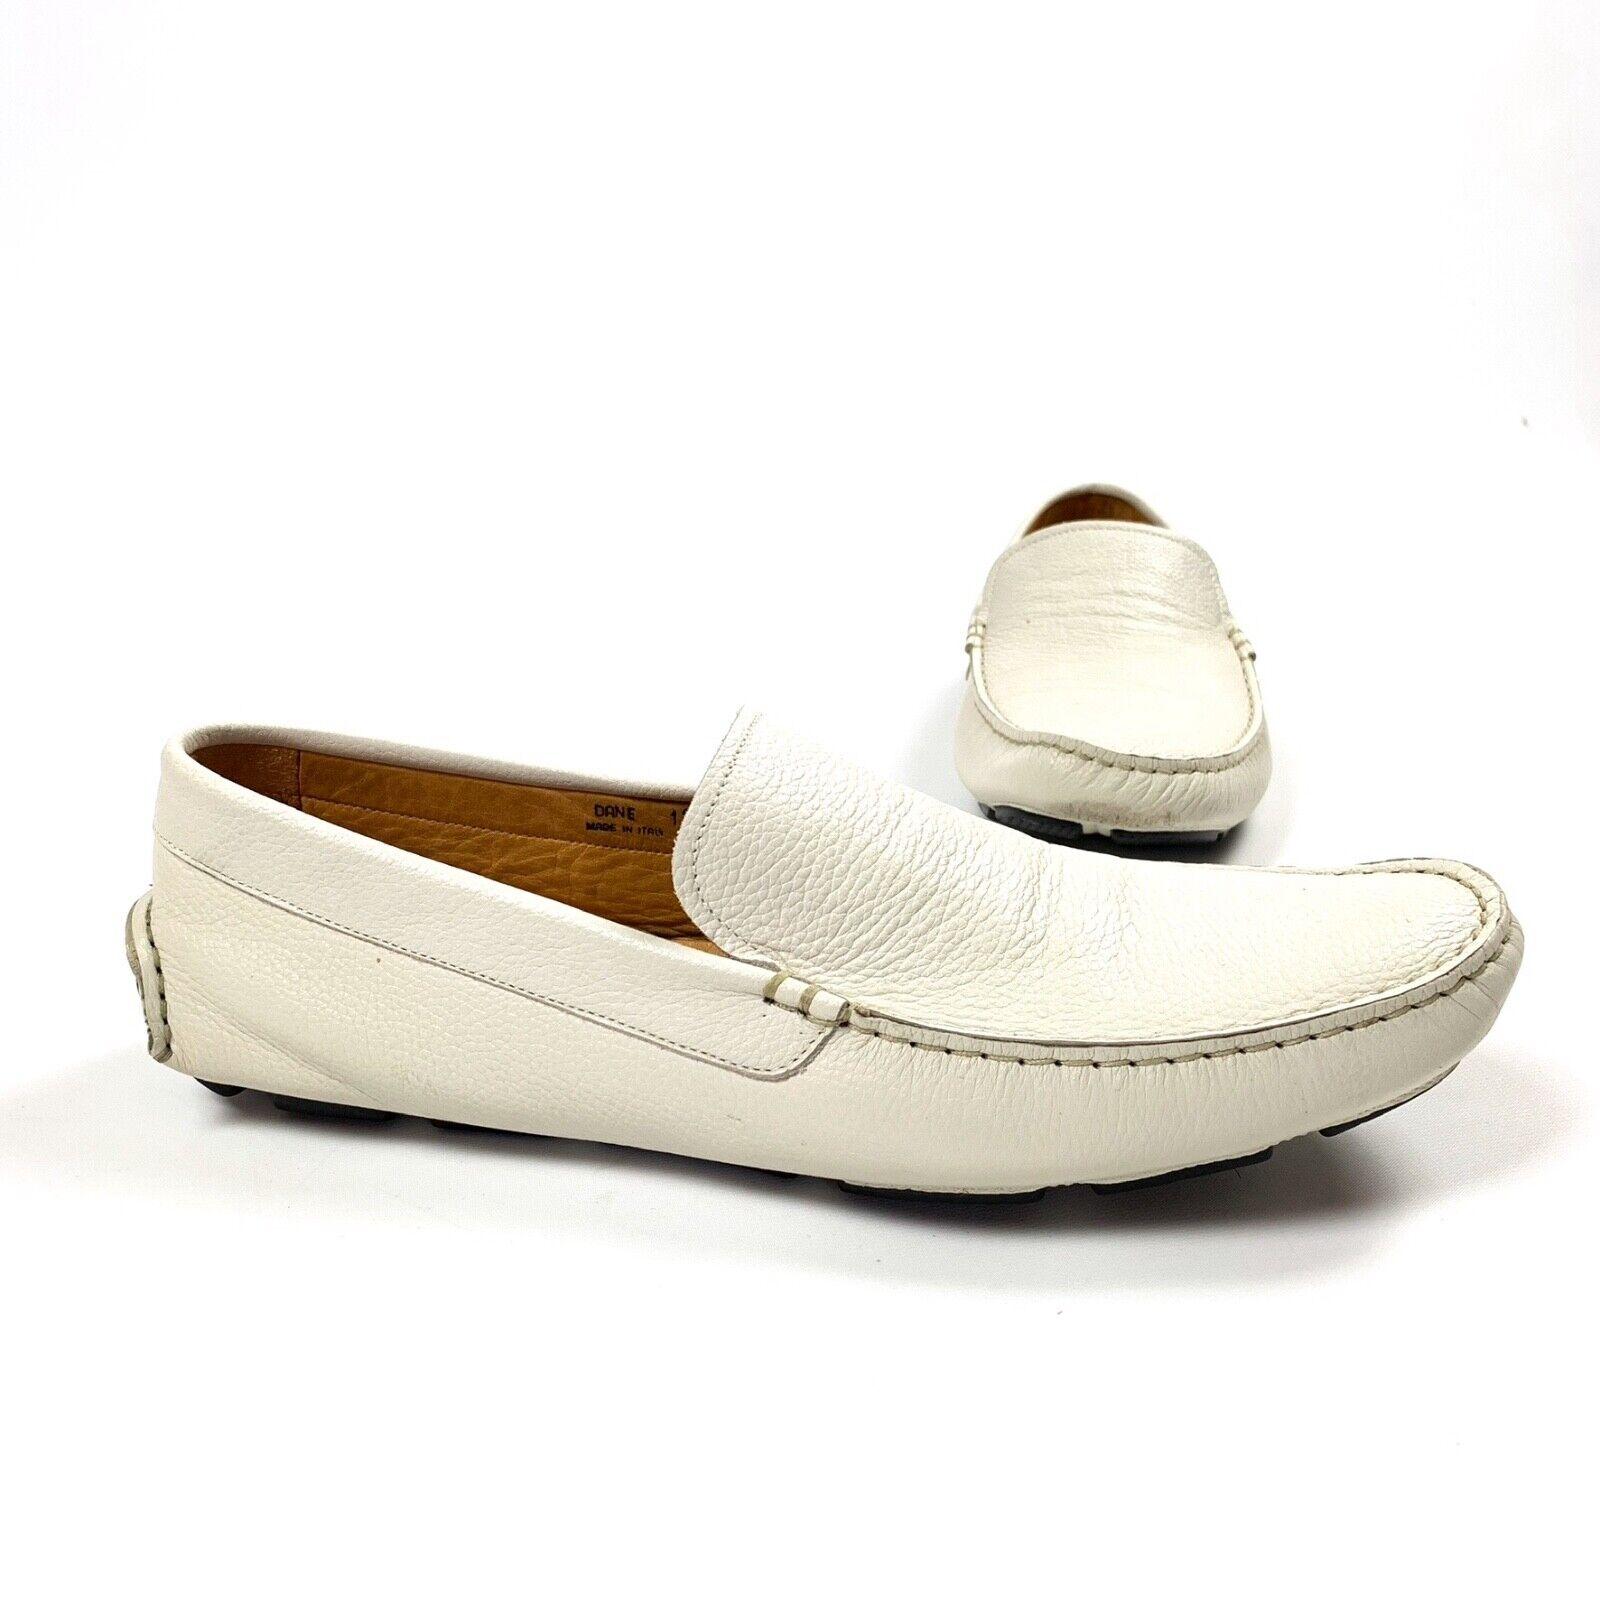 Saks Fifth Avenue Dane Mens   shoes Ivory Size 12